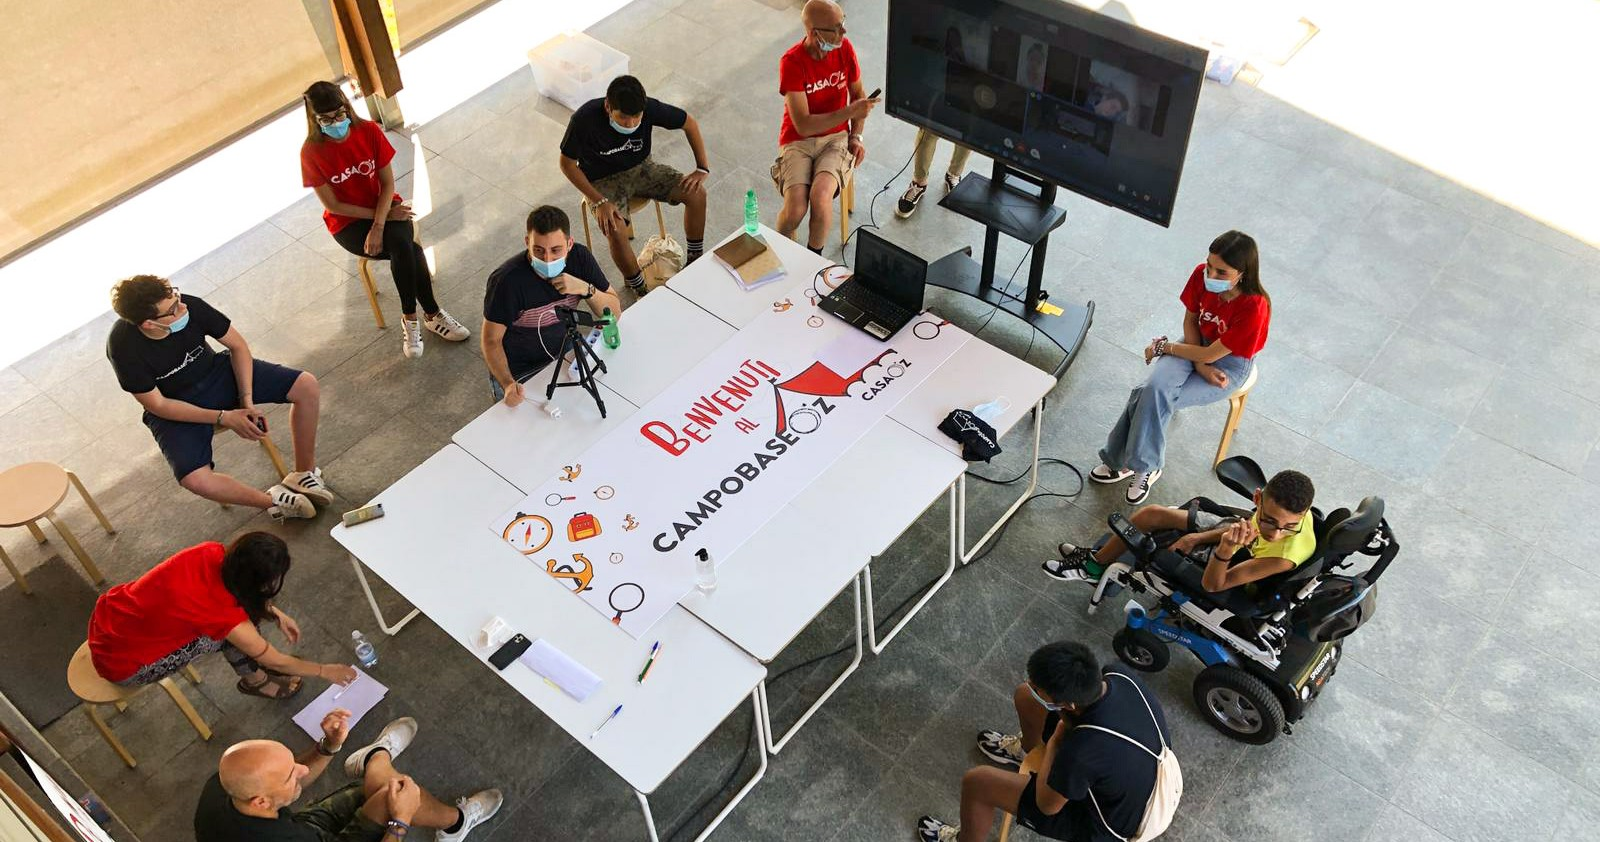 OZLINE: INSIEME A CASAOZ!-CasaOz Onlus